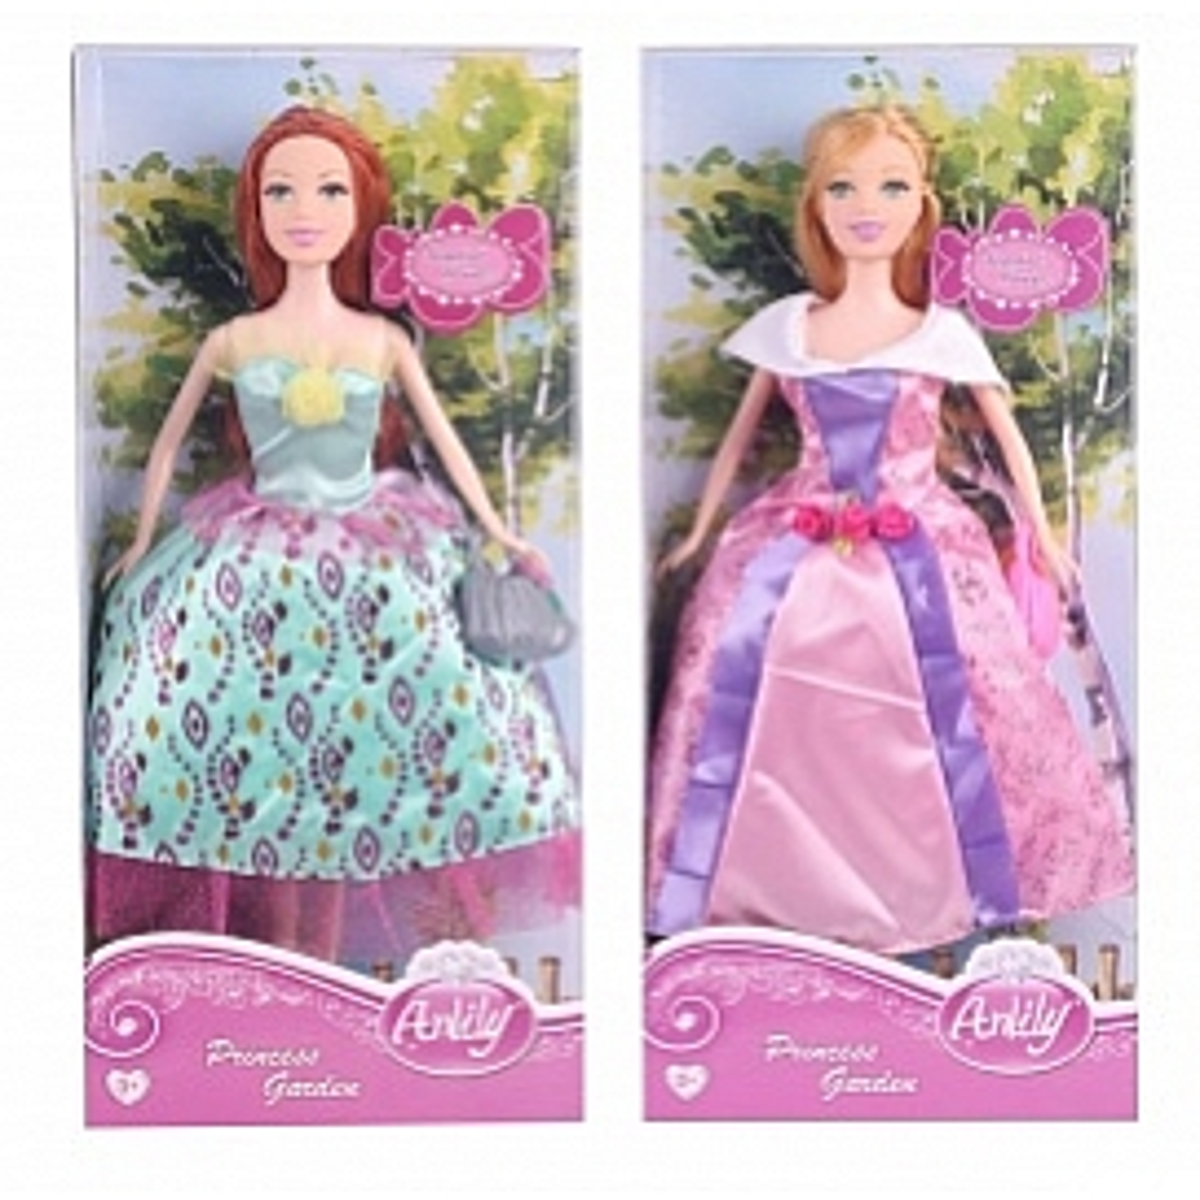 Кукла 29см., в ассортименте (Барби, Братц и аналог), 47876